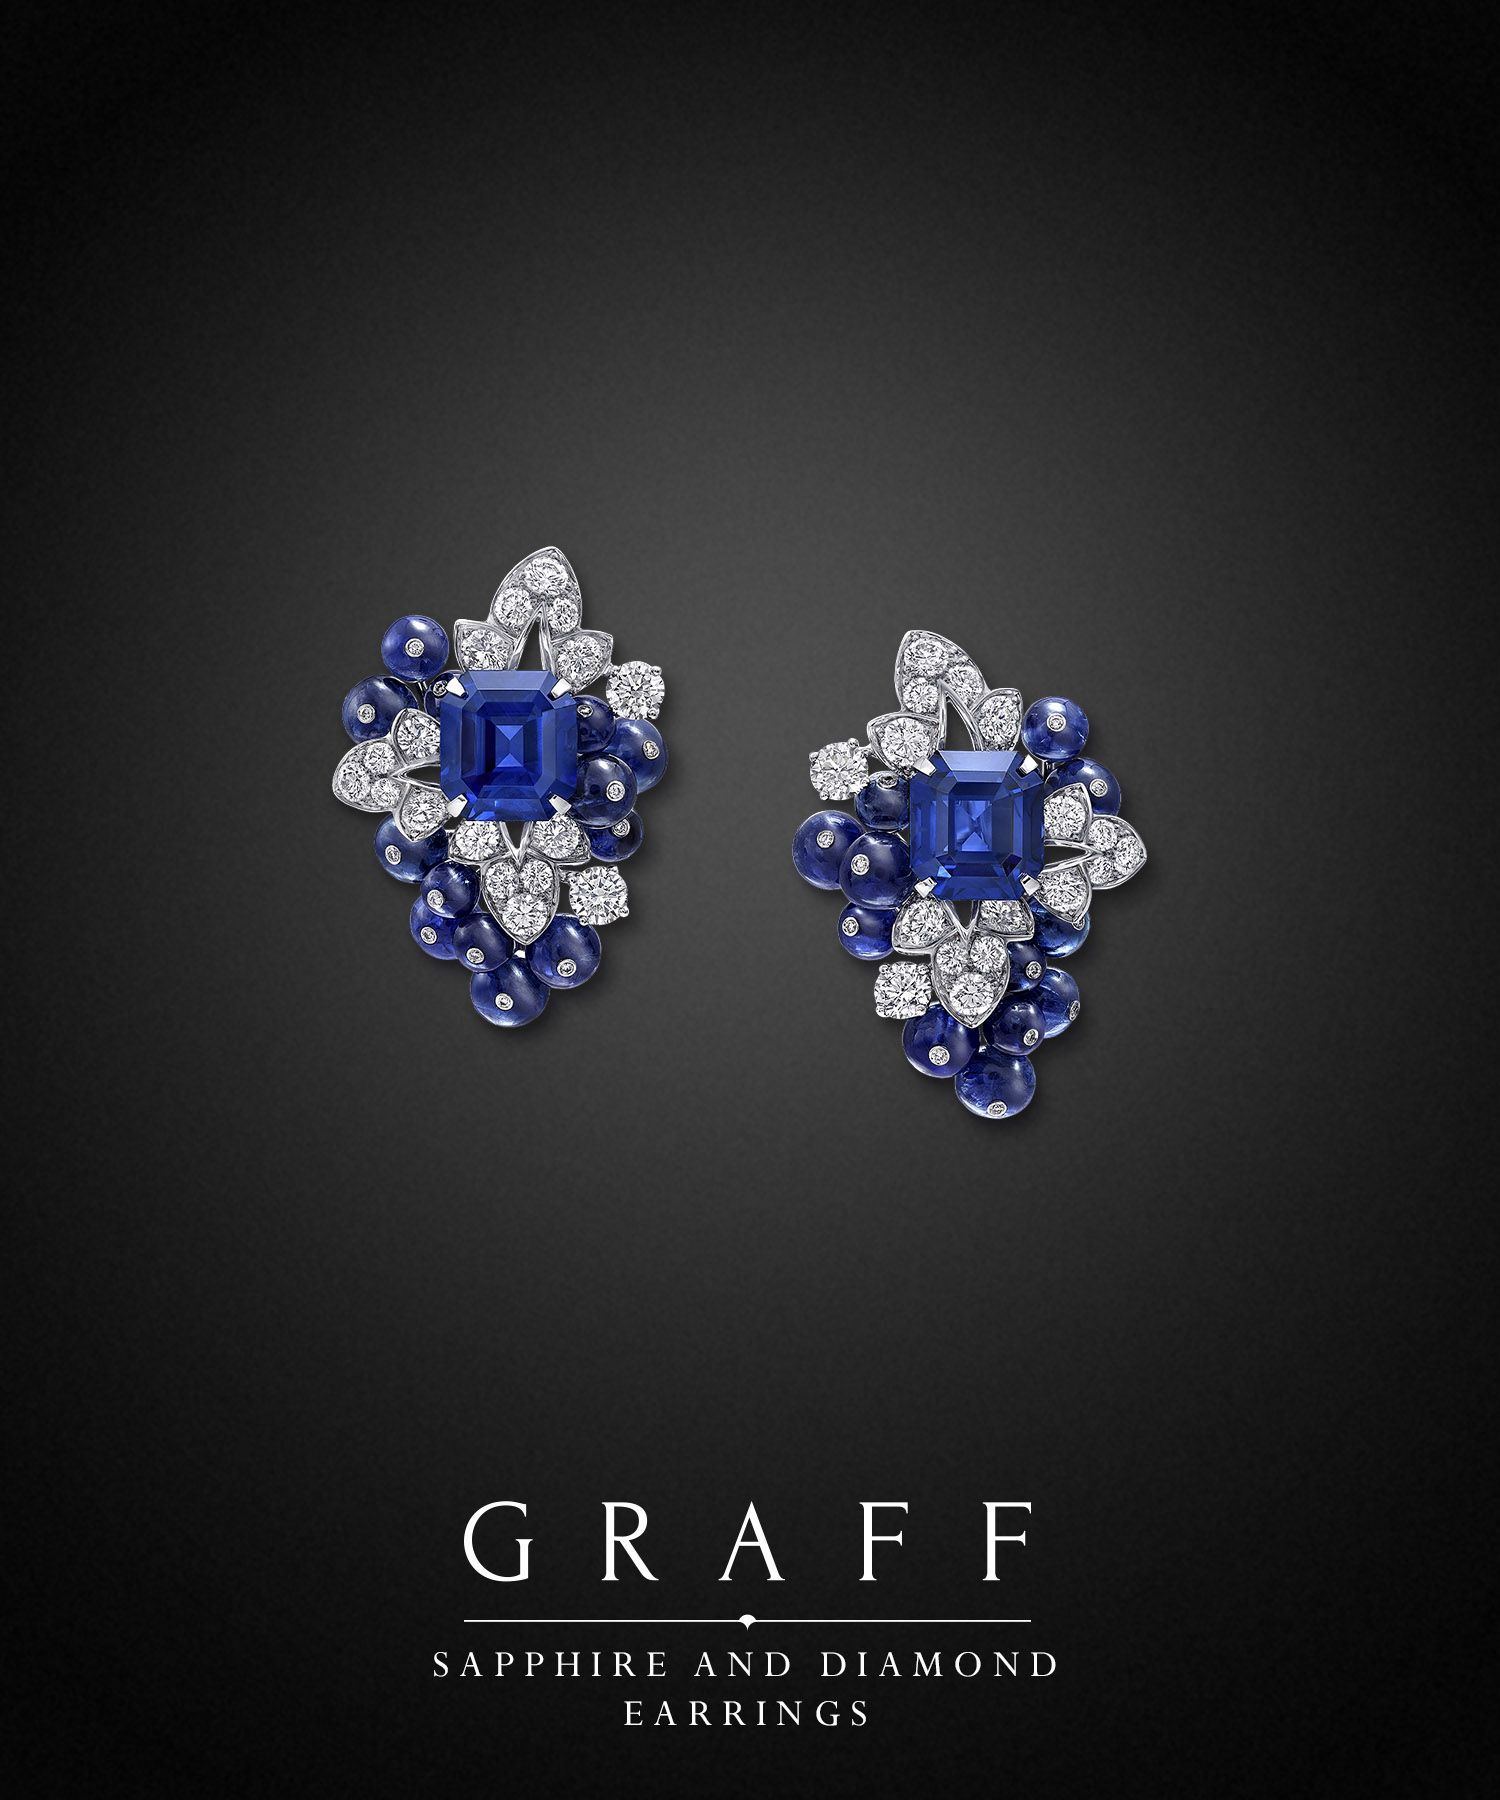 Sapphire And Diamond Earrings Graff Diamonds Sapphire And Diamond Earrings Graff Diamonds Earrings